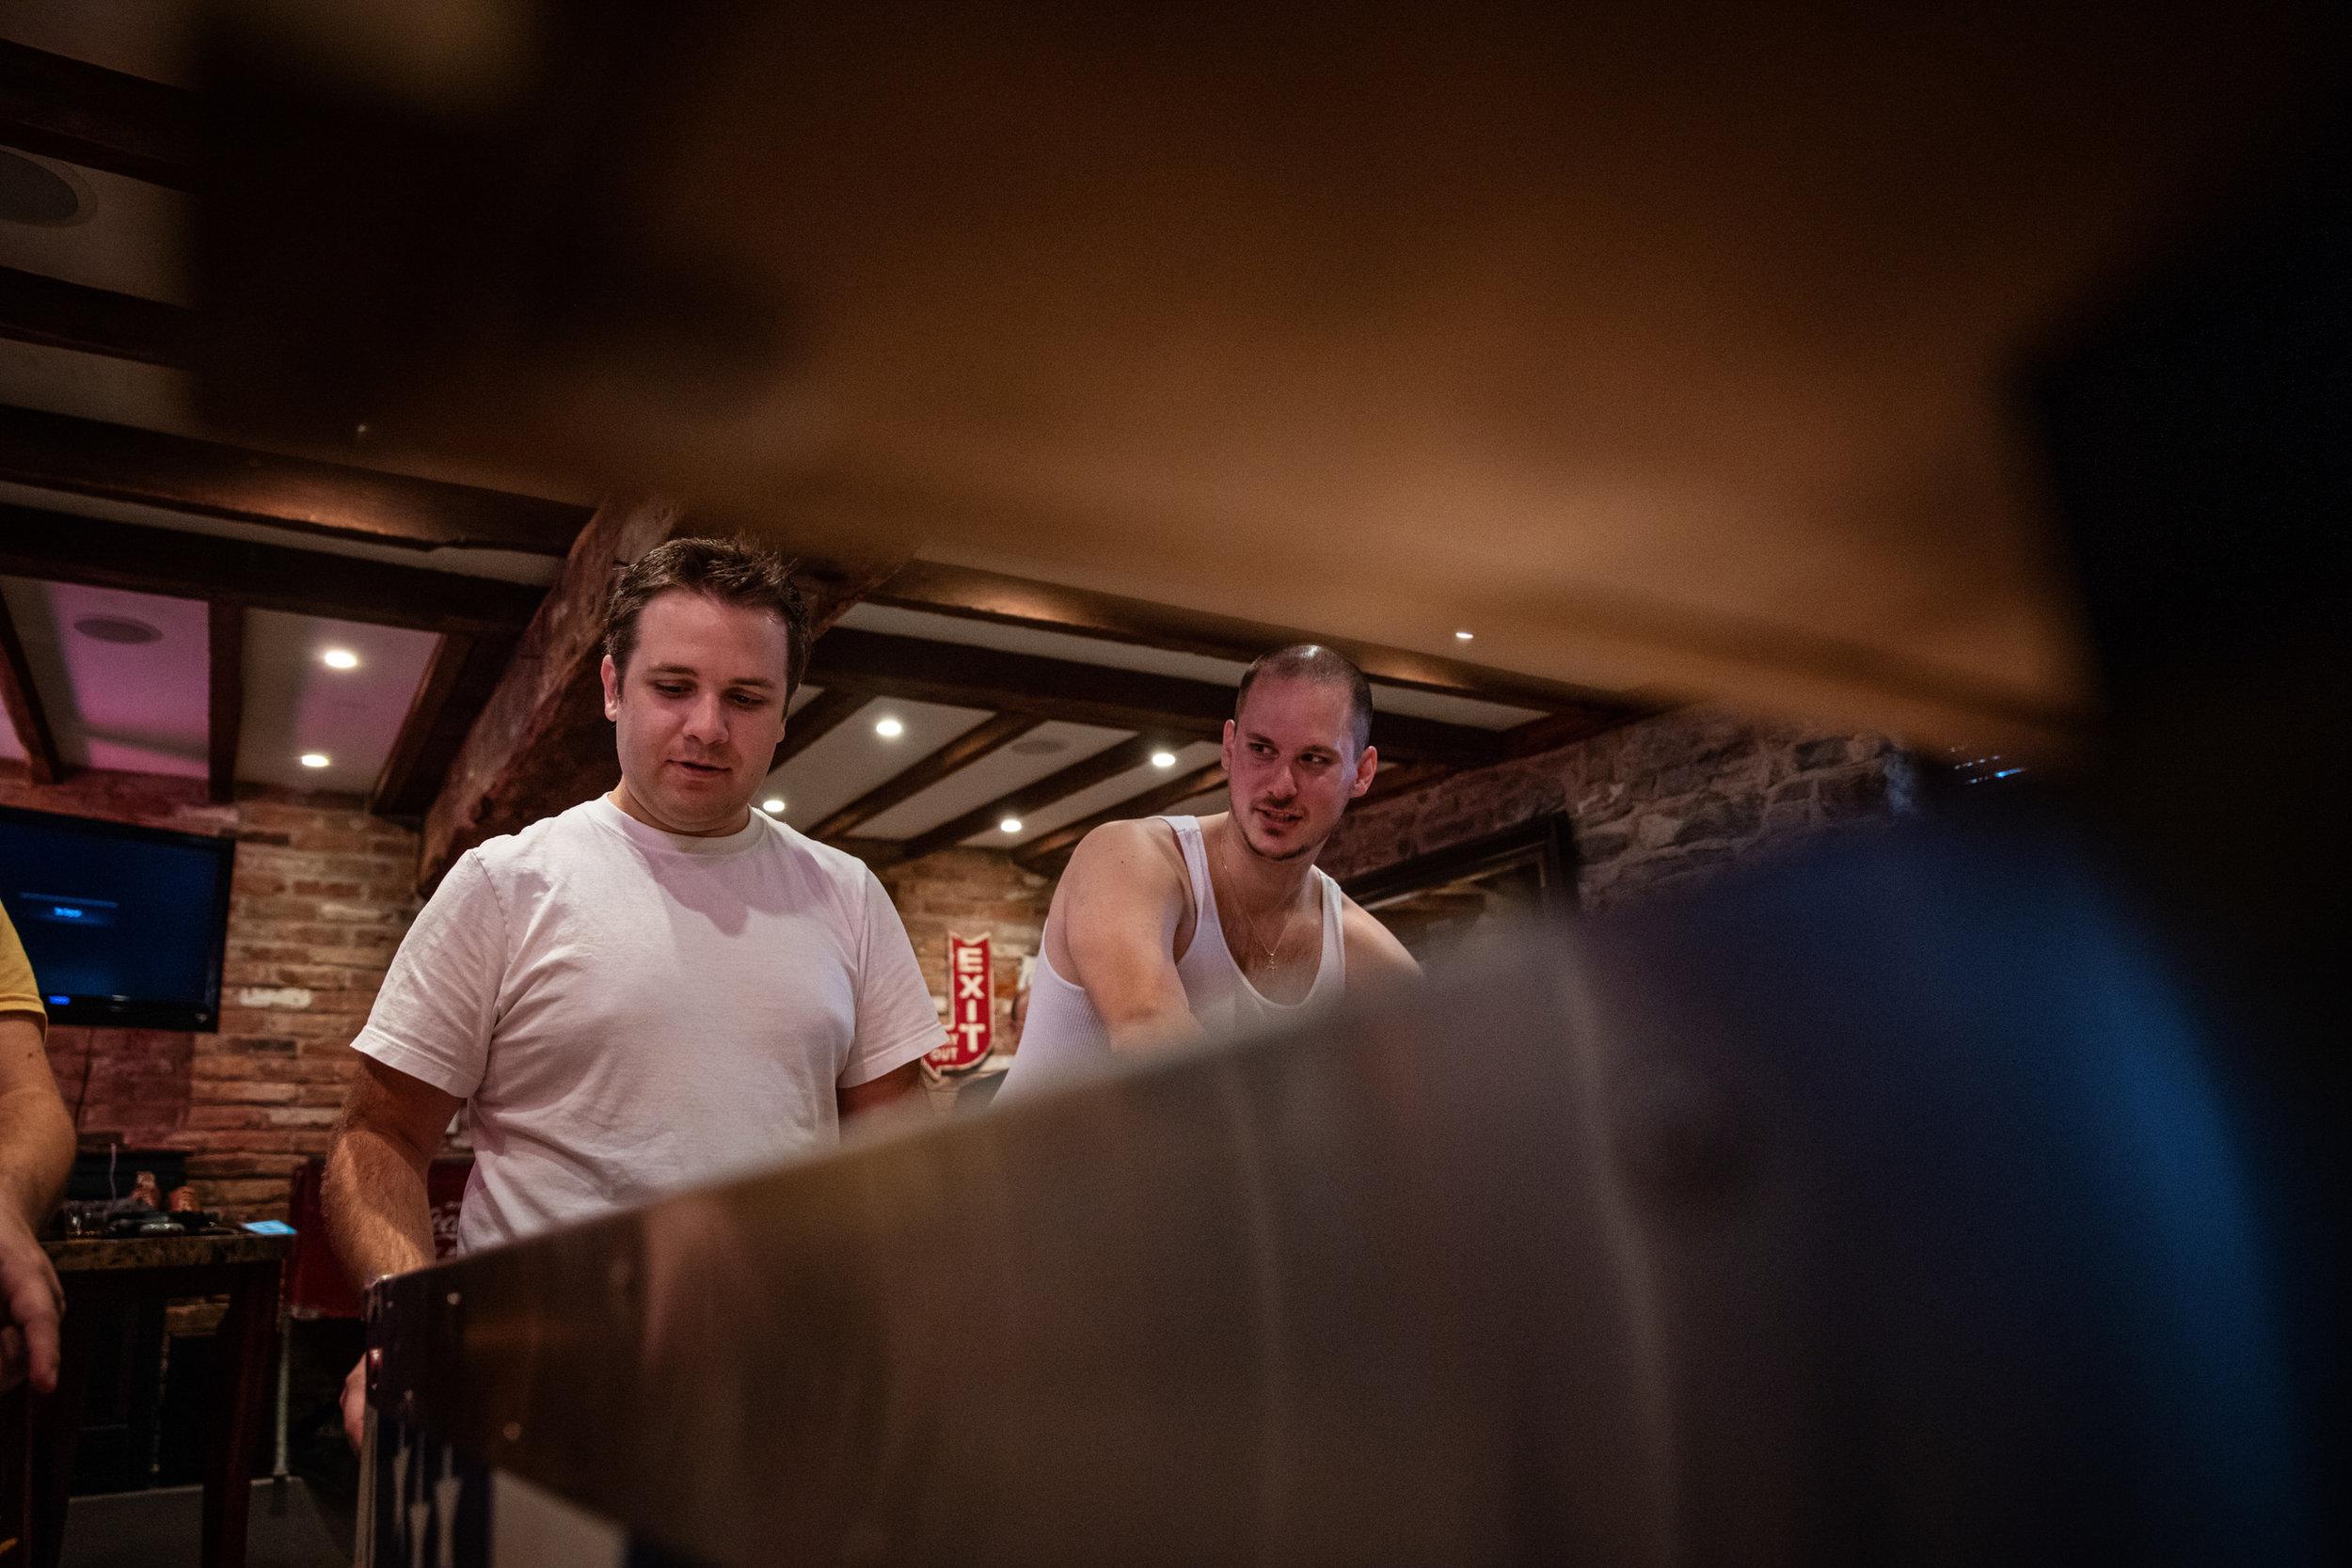 WalkersOverlookWedding-Angela&Ben-Getting Ready-22.jpg